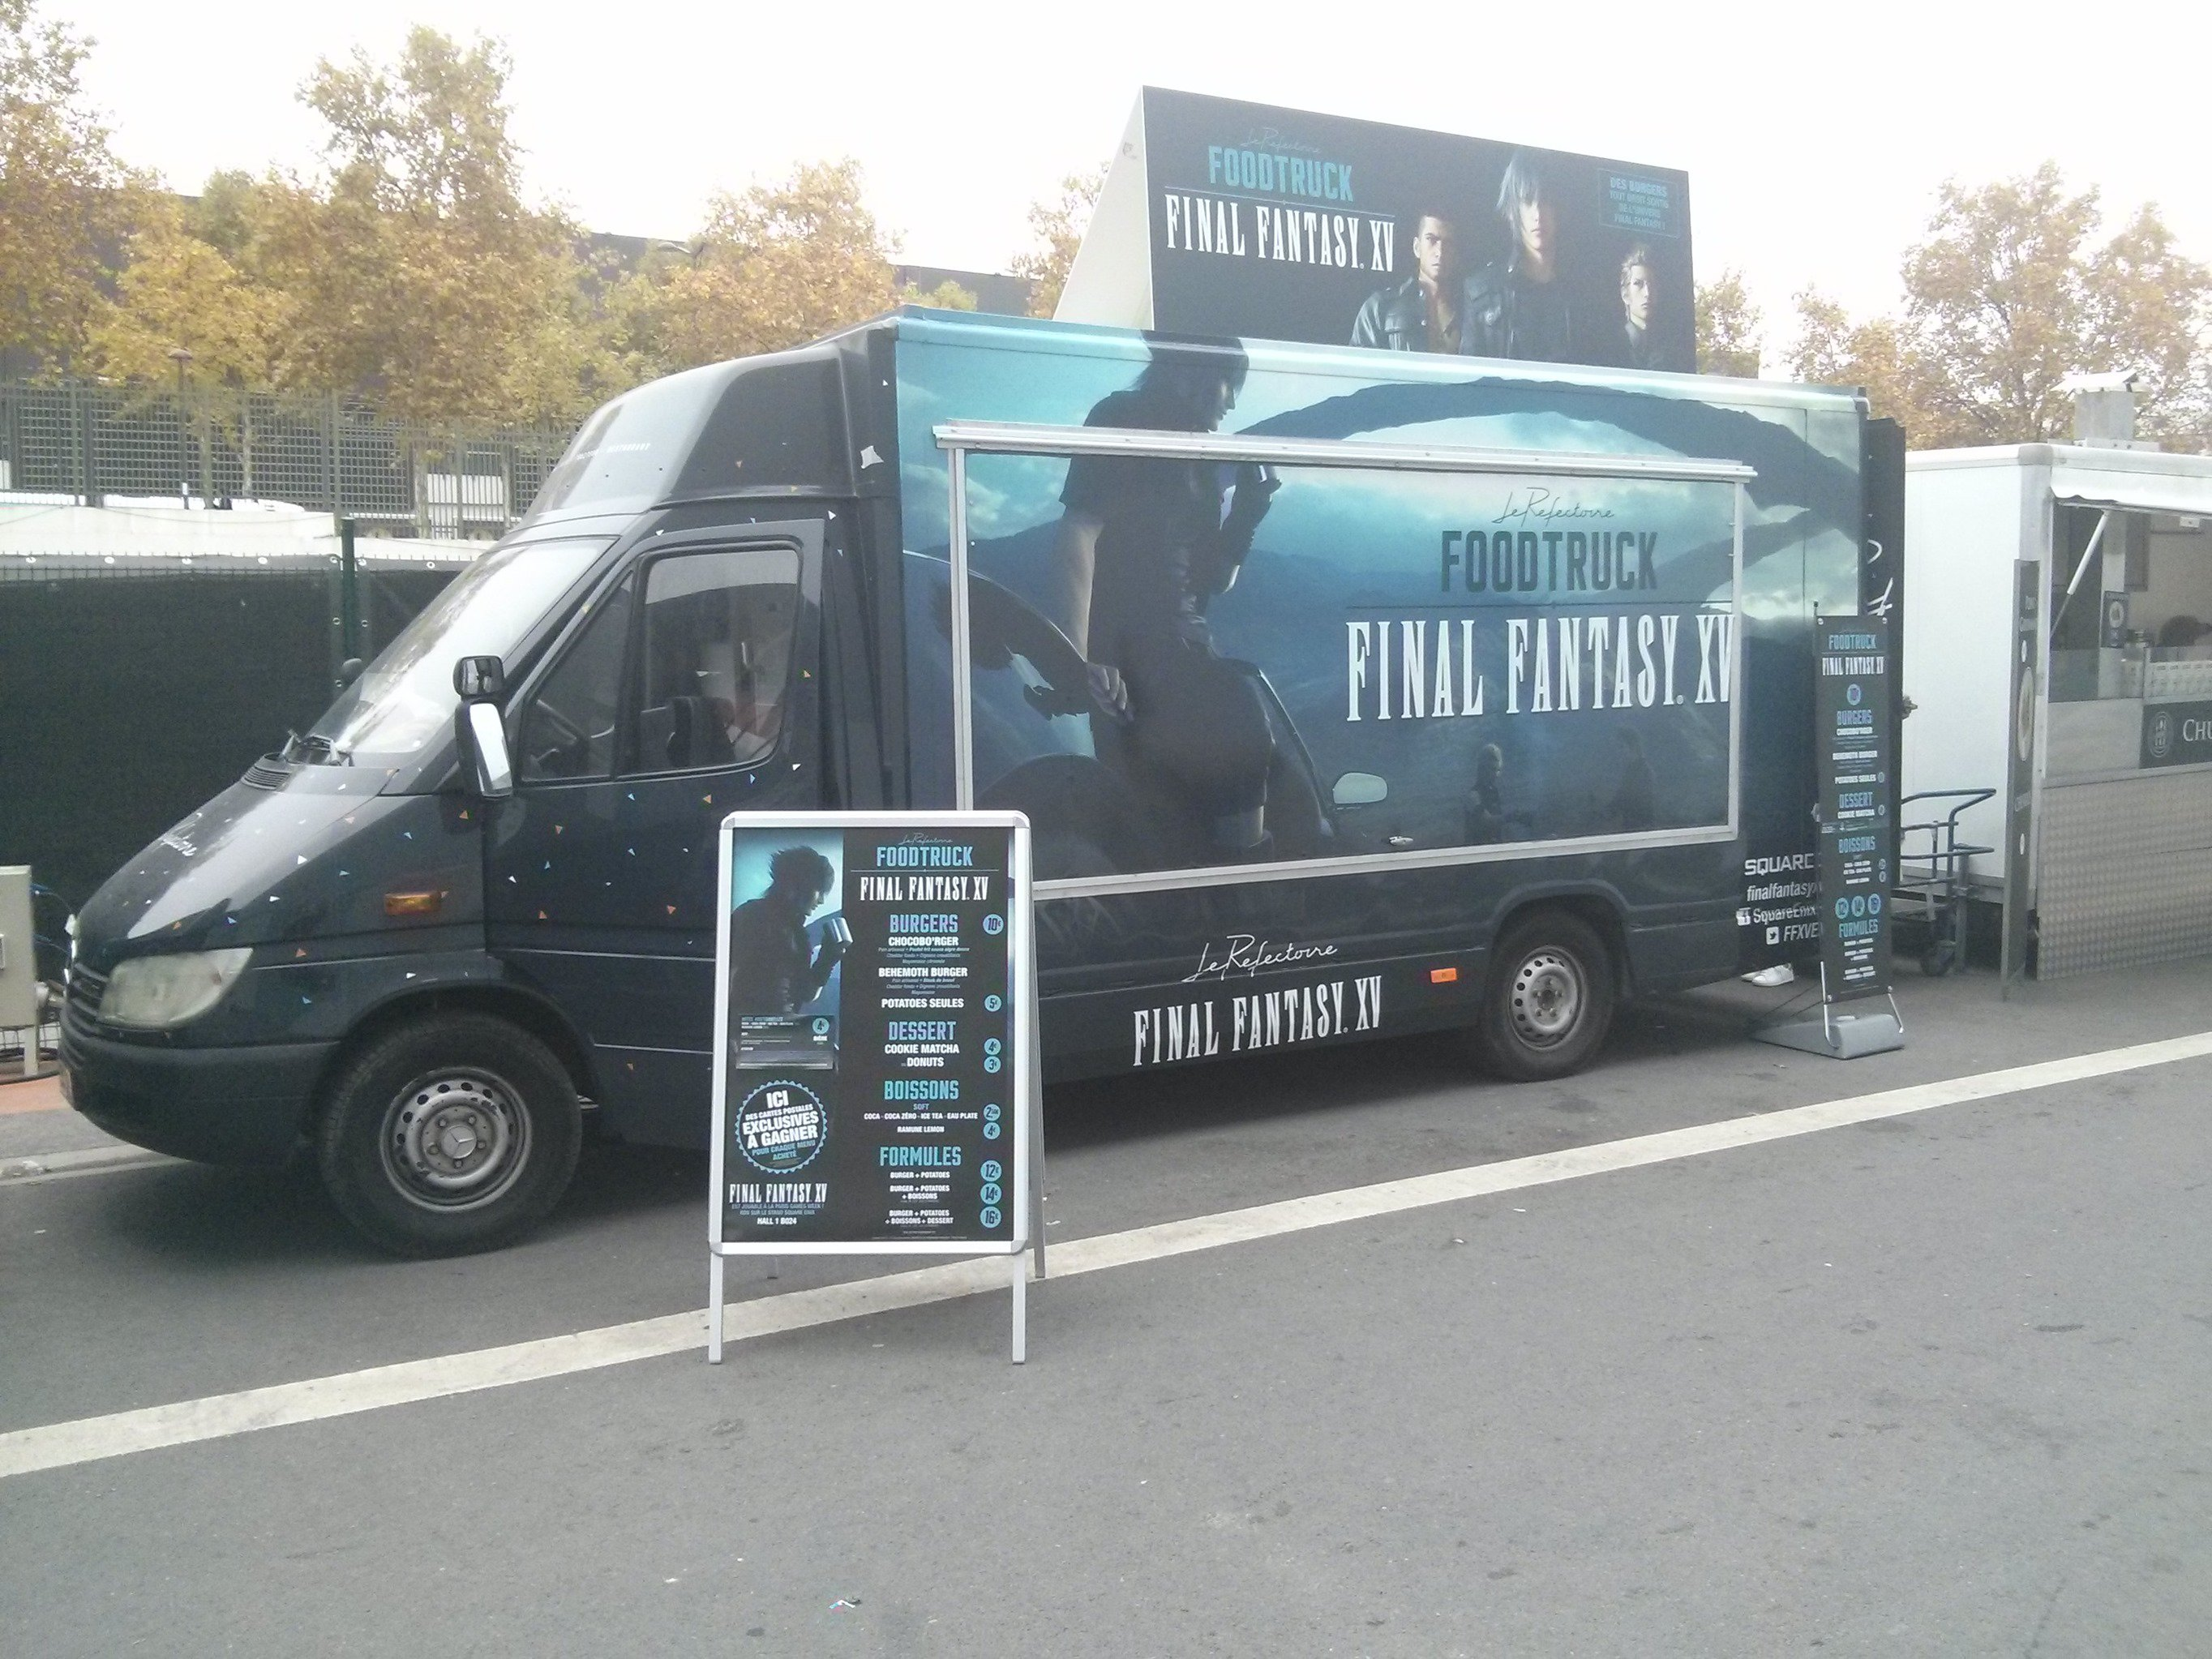 Final Fantasy XV Food Truck Serves Burgers 2